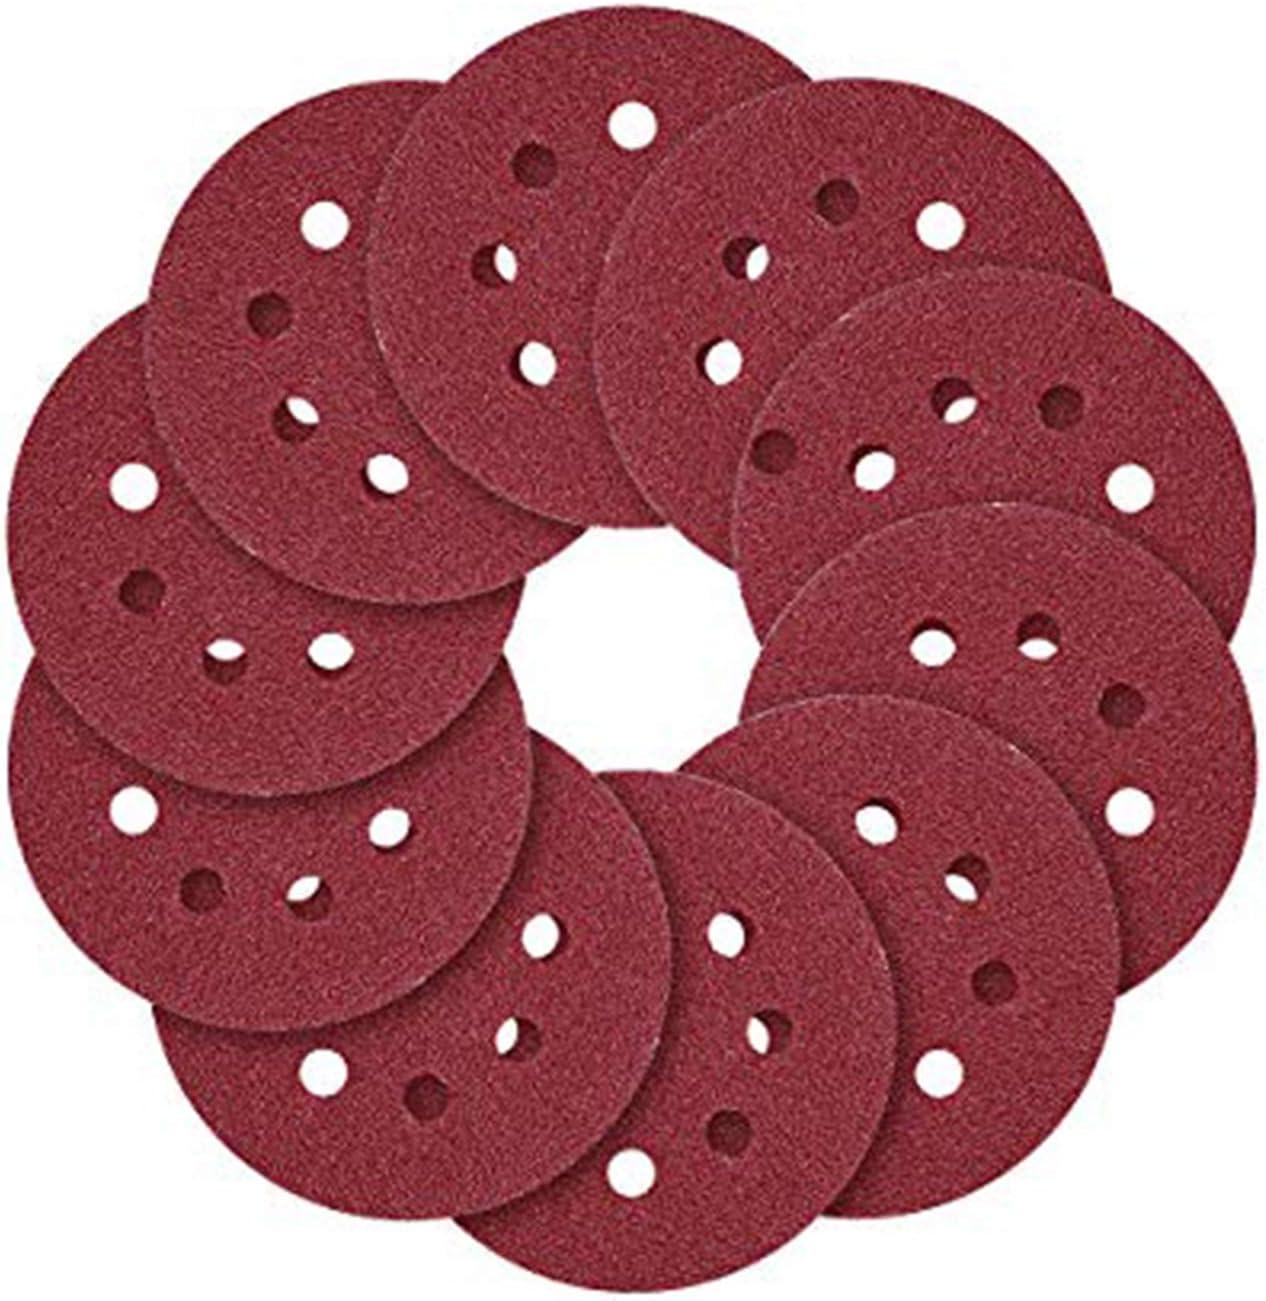 Yoohey 7 Inch 8 Hole Hook and Loop Sandpaper Sanding Disc Sandpaper Sanding Sheets Assorted 100 Grits Sander Paper 30pcs